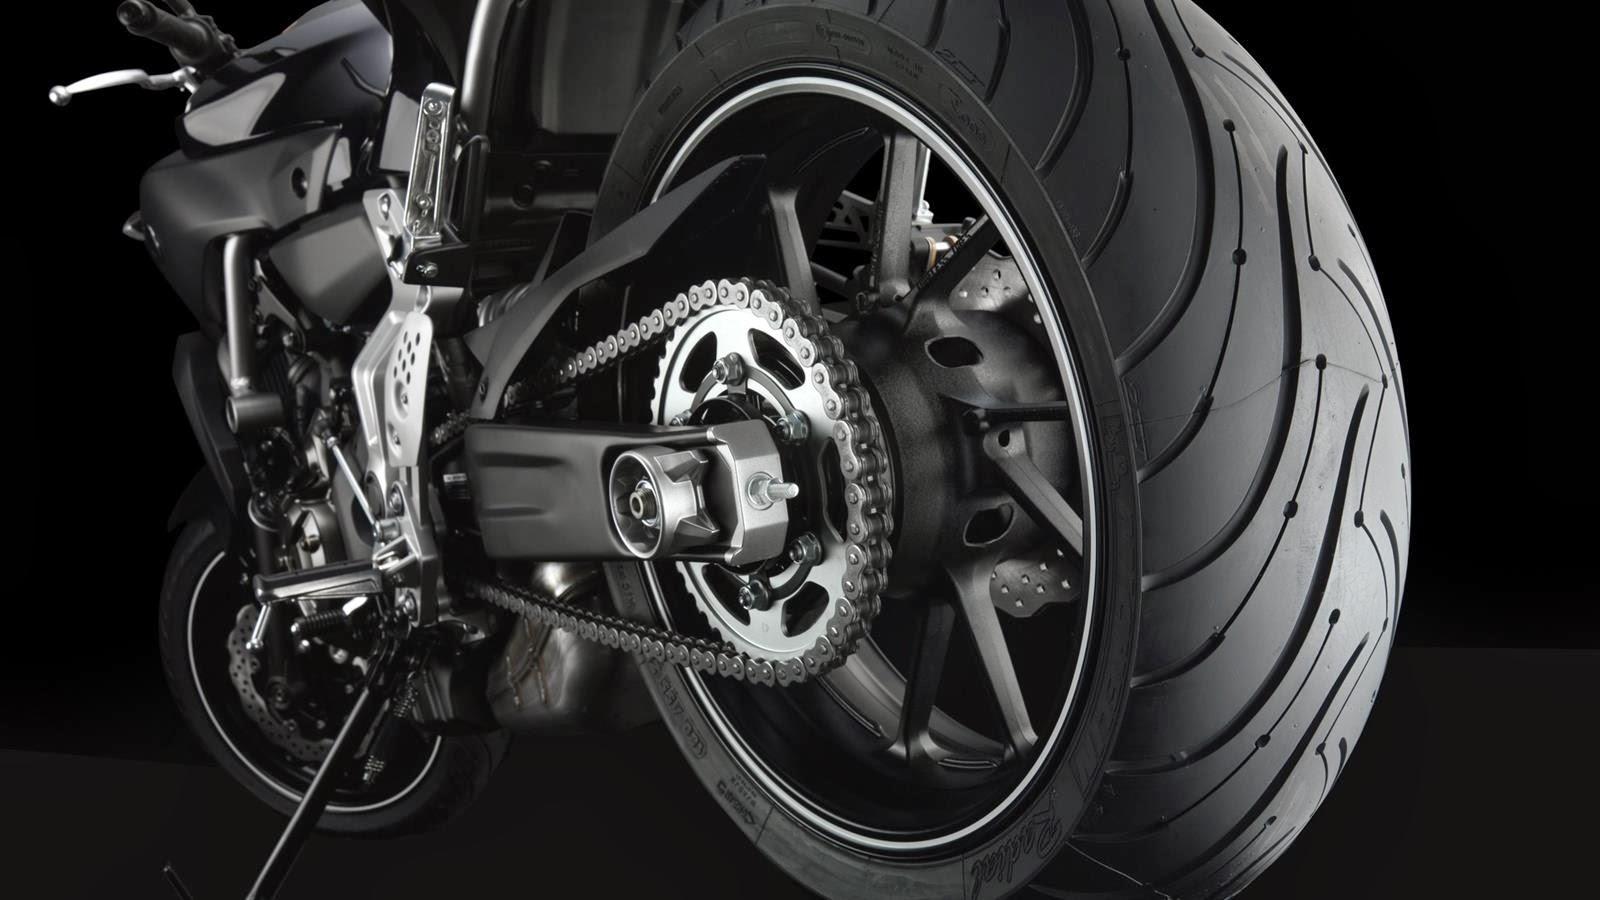 jornal do motociclista yamaha mt 07 2014 a surpreendente bicil ndrica de 690cc. Black Bedroom Furniture Sets. Home Design Ideas